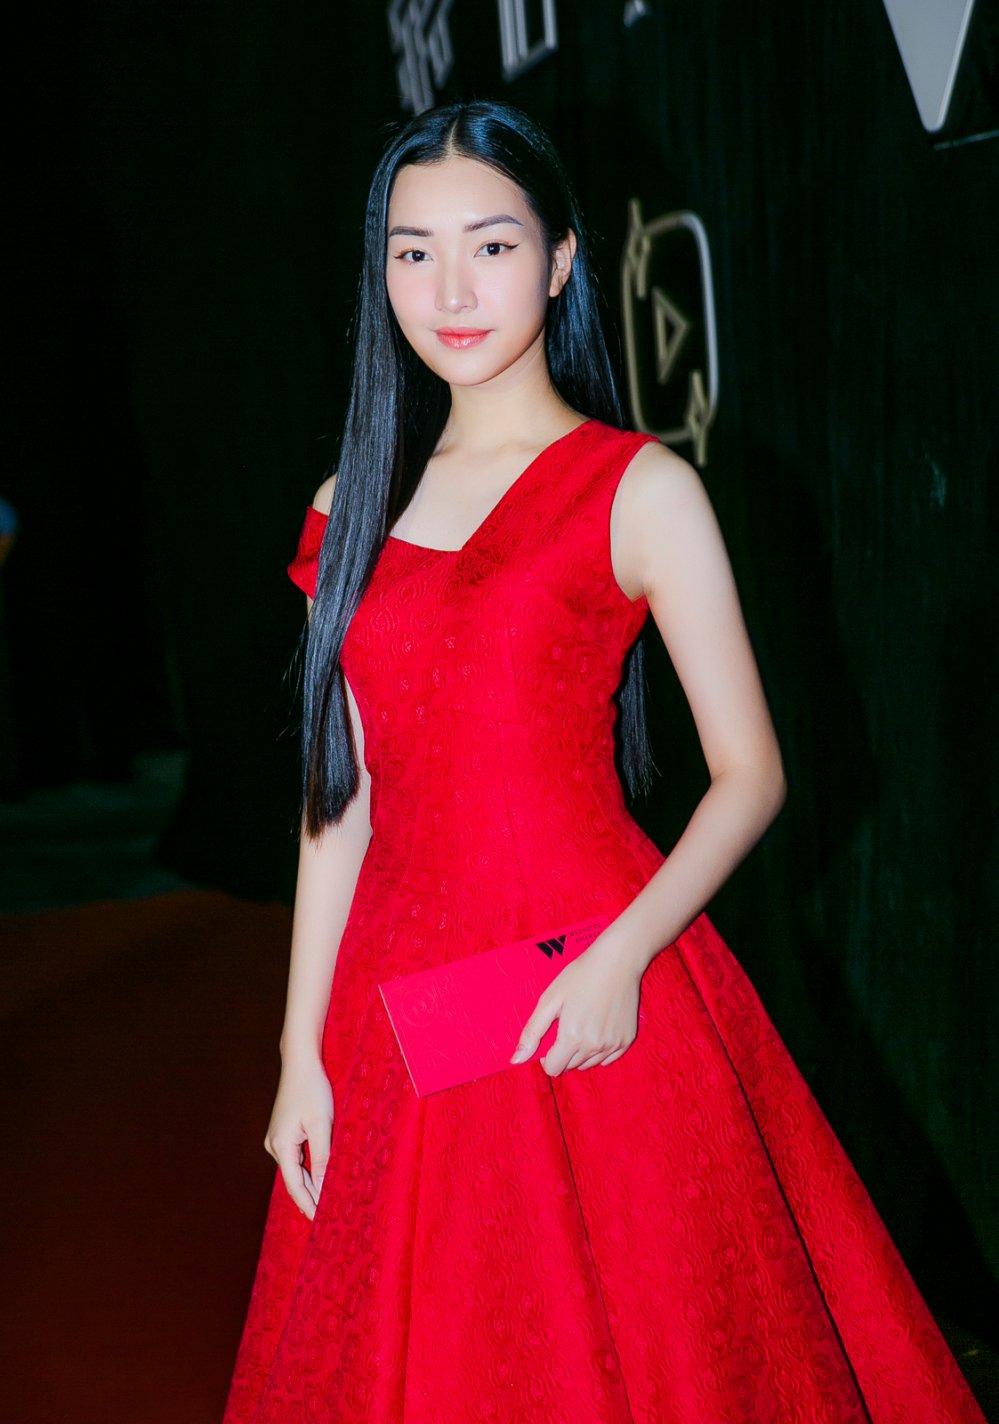 Xuc dong khoanh khac Son Tung M-TP hat, be Bom dem dan 'Remember me' hinh anh 14